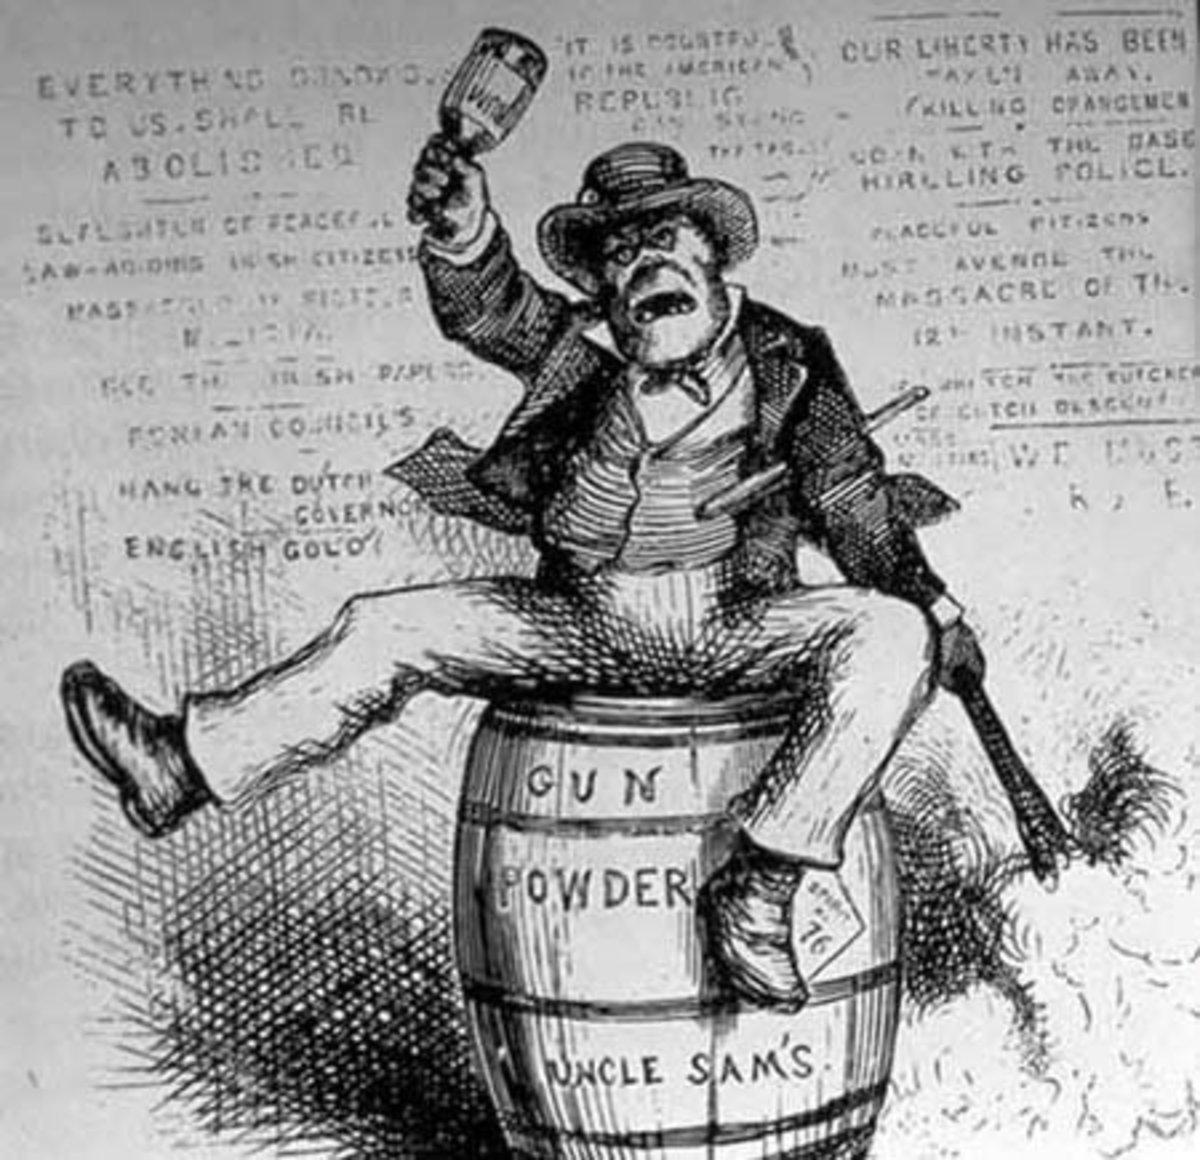 A racist cartoon depiction of an Irish immigrant.